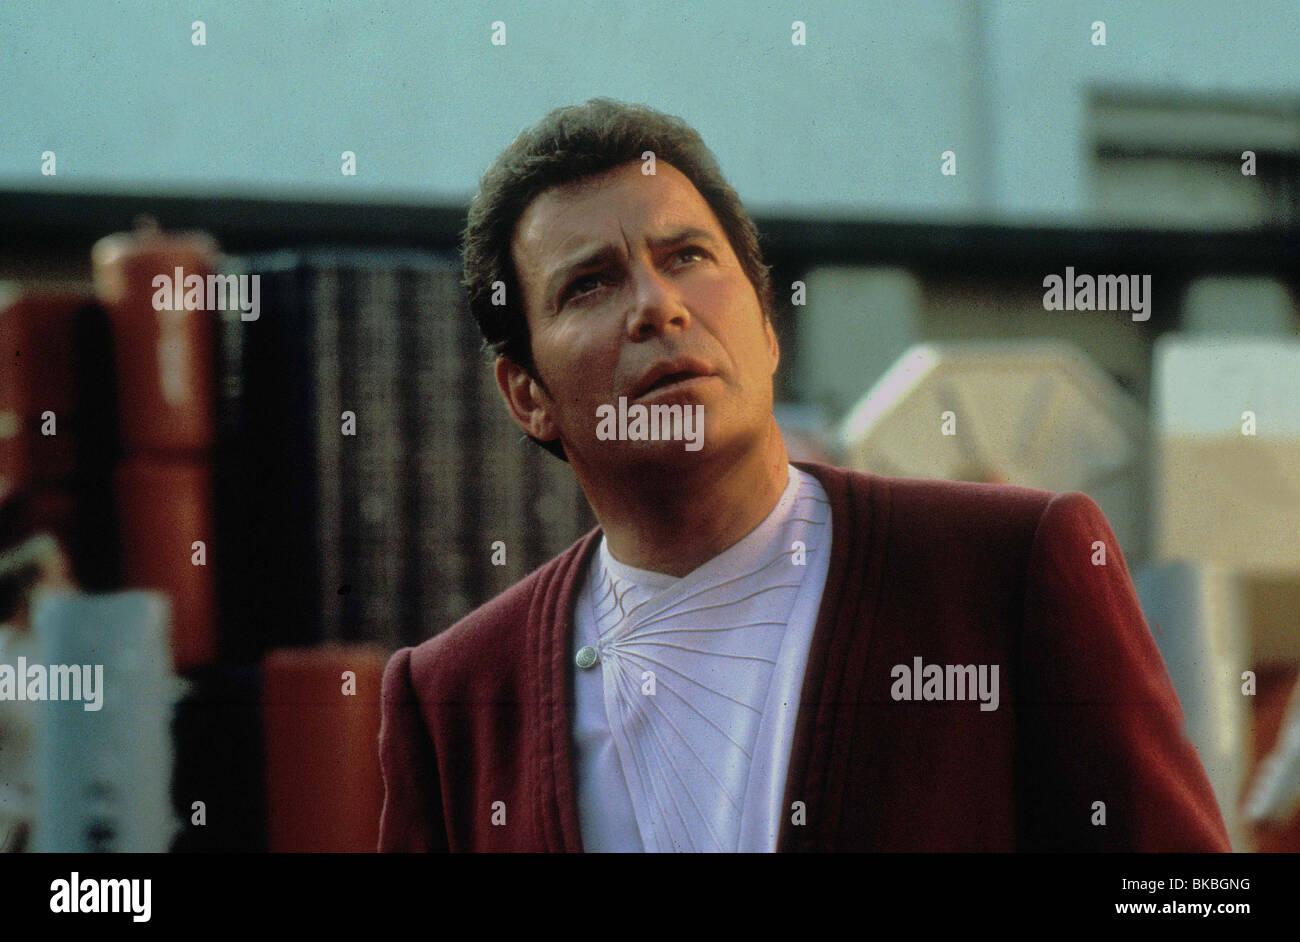 STAR TREK IV: THE VOYAGE HOME (1986) WILLIAM SHATNER ST4 006 - Stock Image